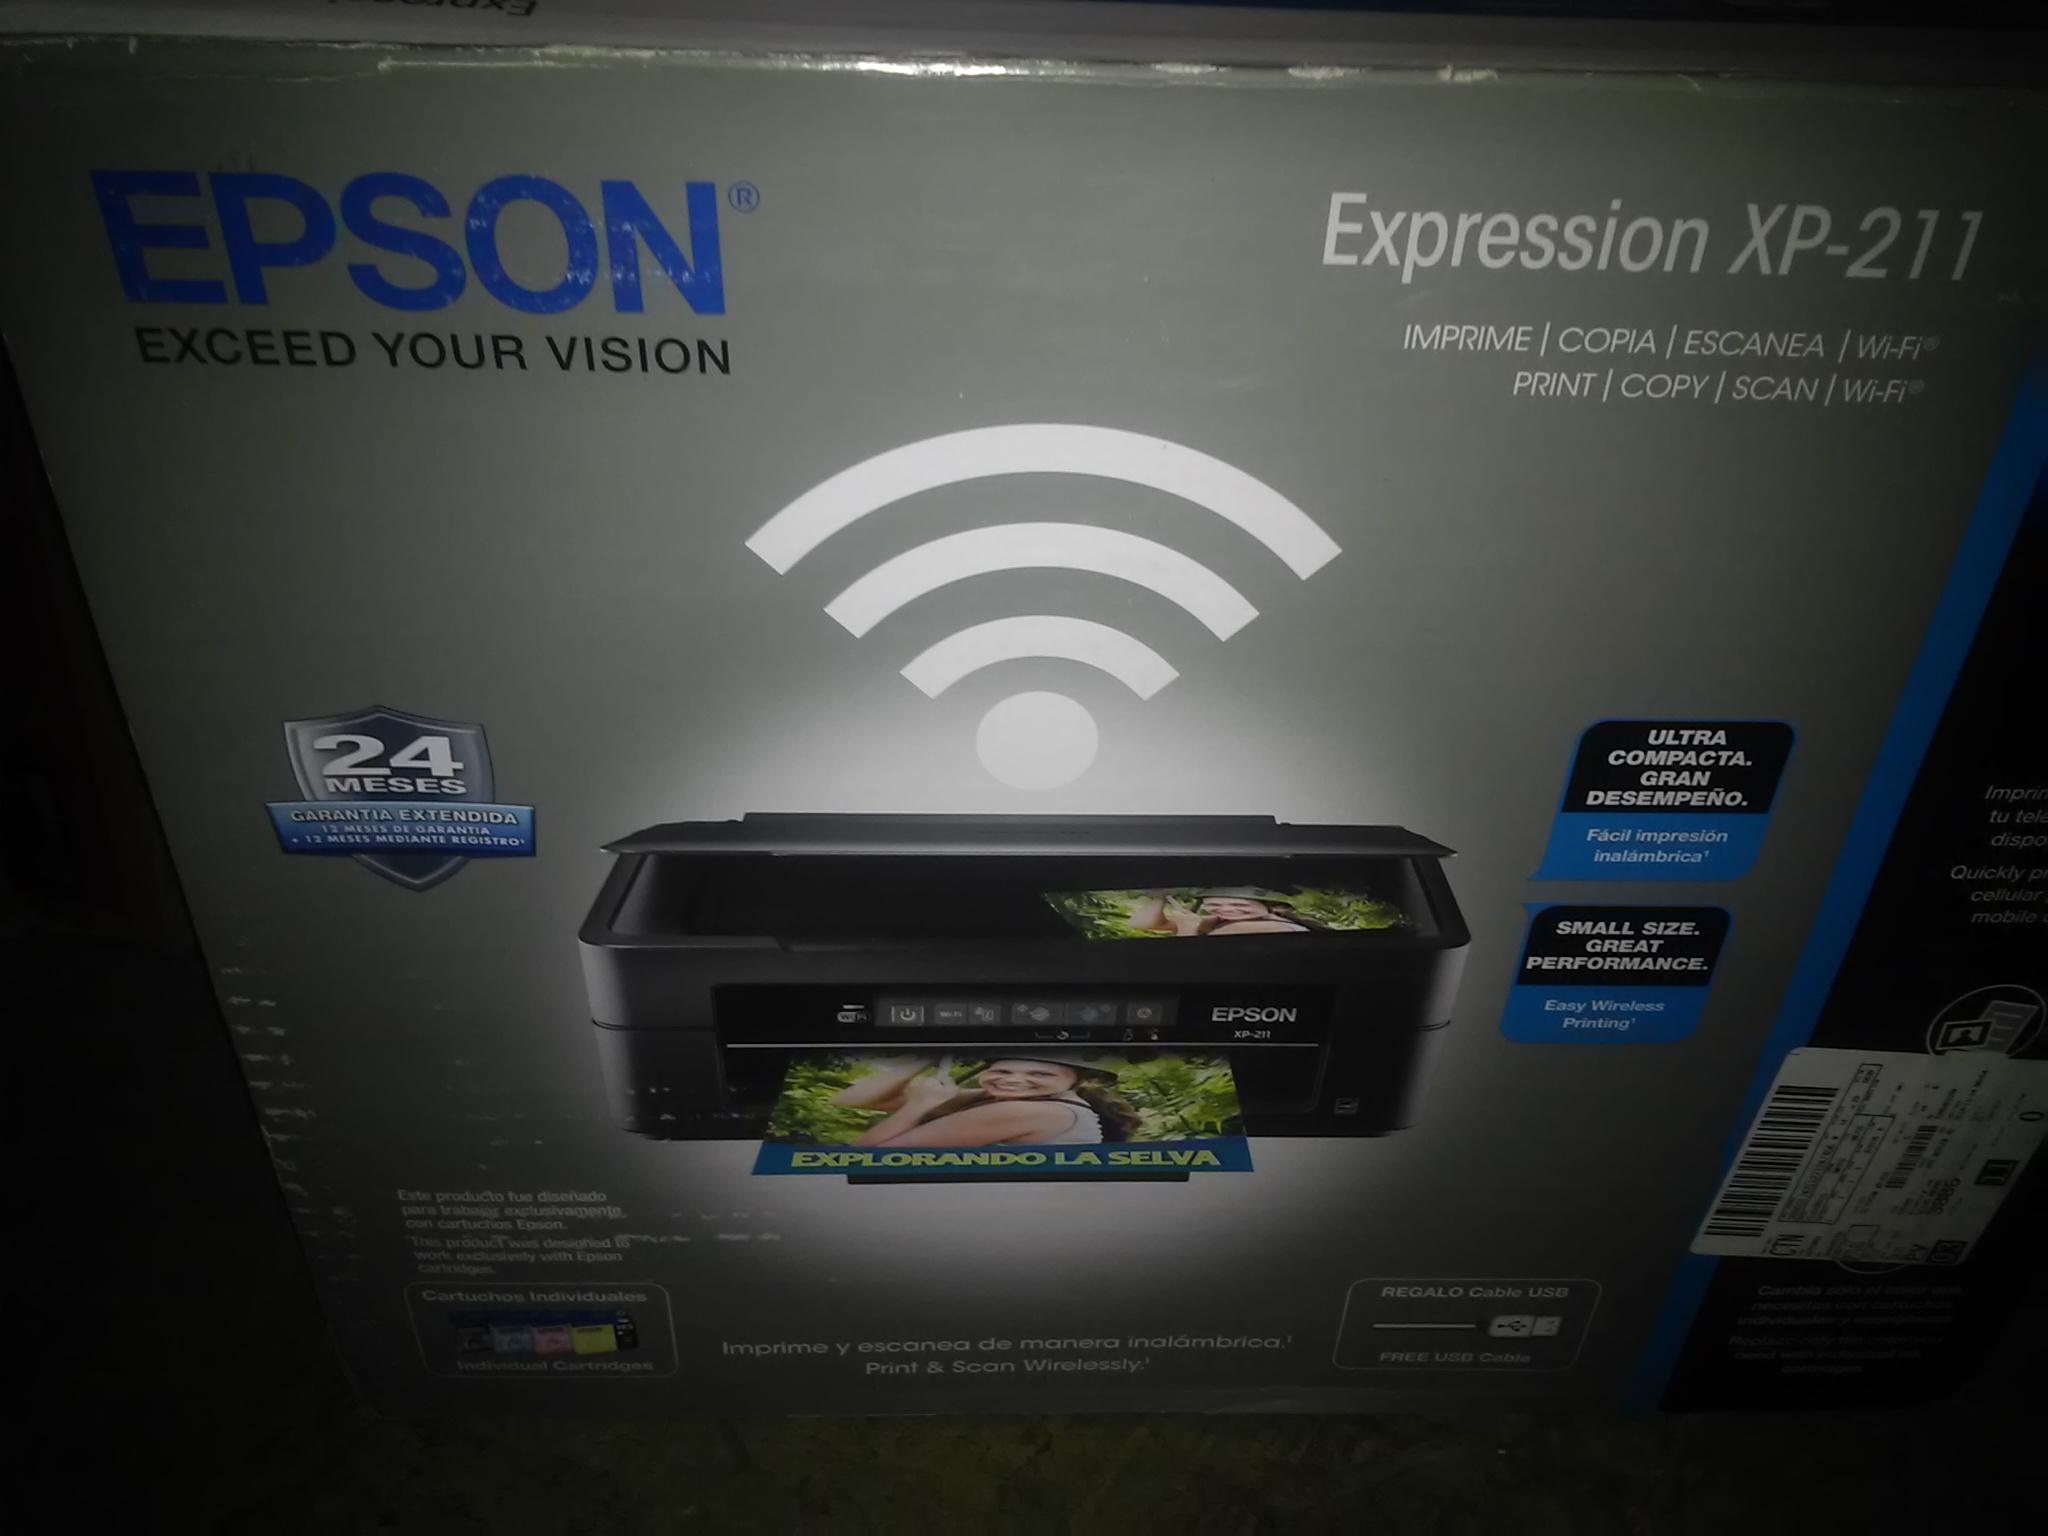 Walmart las animas puebla: Multifuncional Epson XP-211 $999